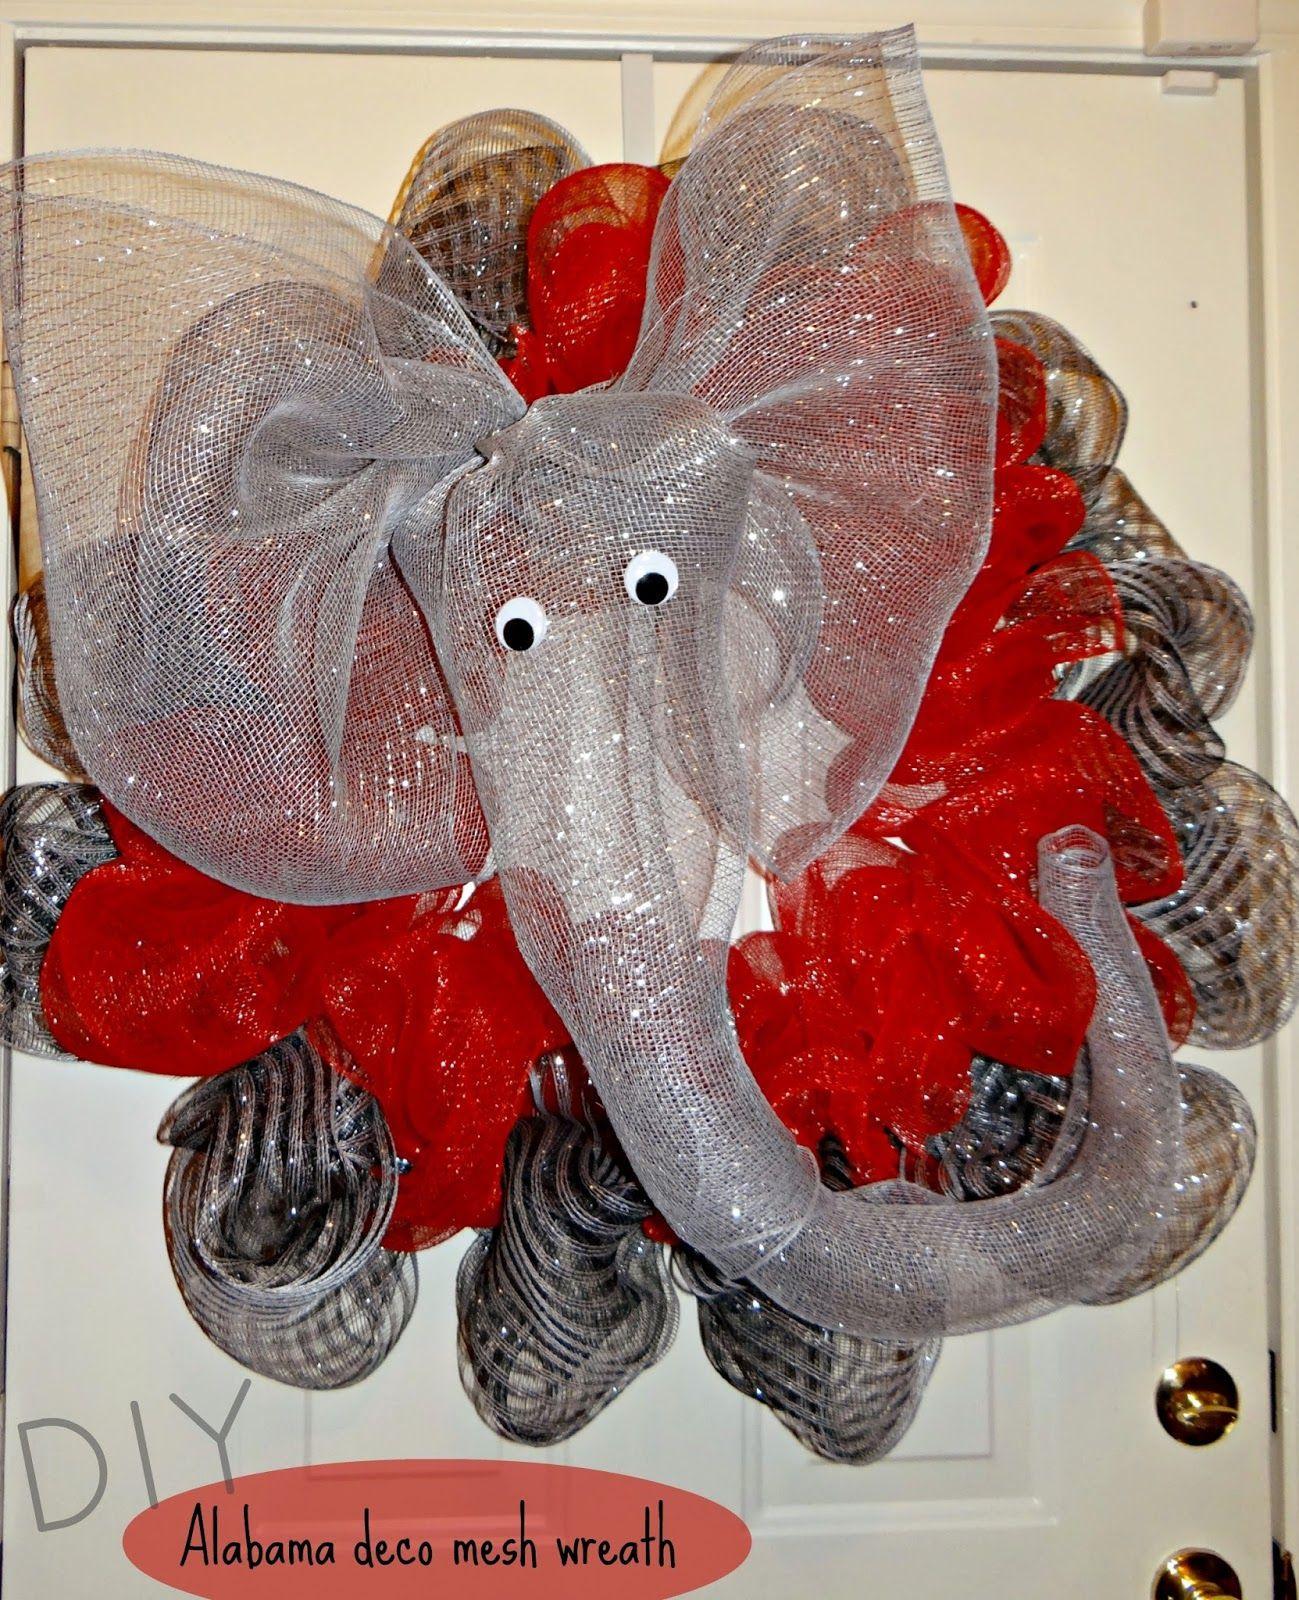 Best ideas about Mesh Wreaths DIY . Save or Pin DIY Alabama deco mesh wreath Kelseycrumpton Now.